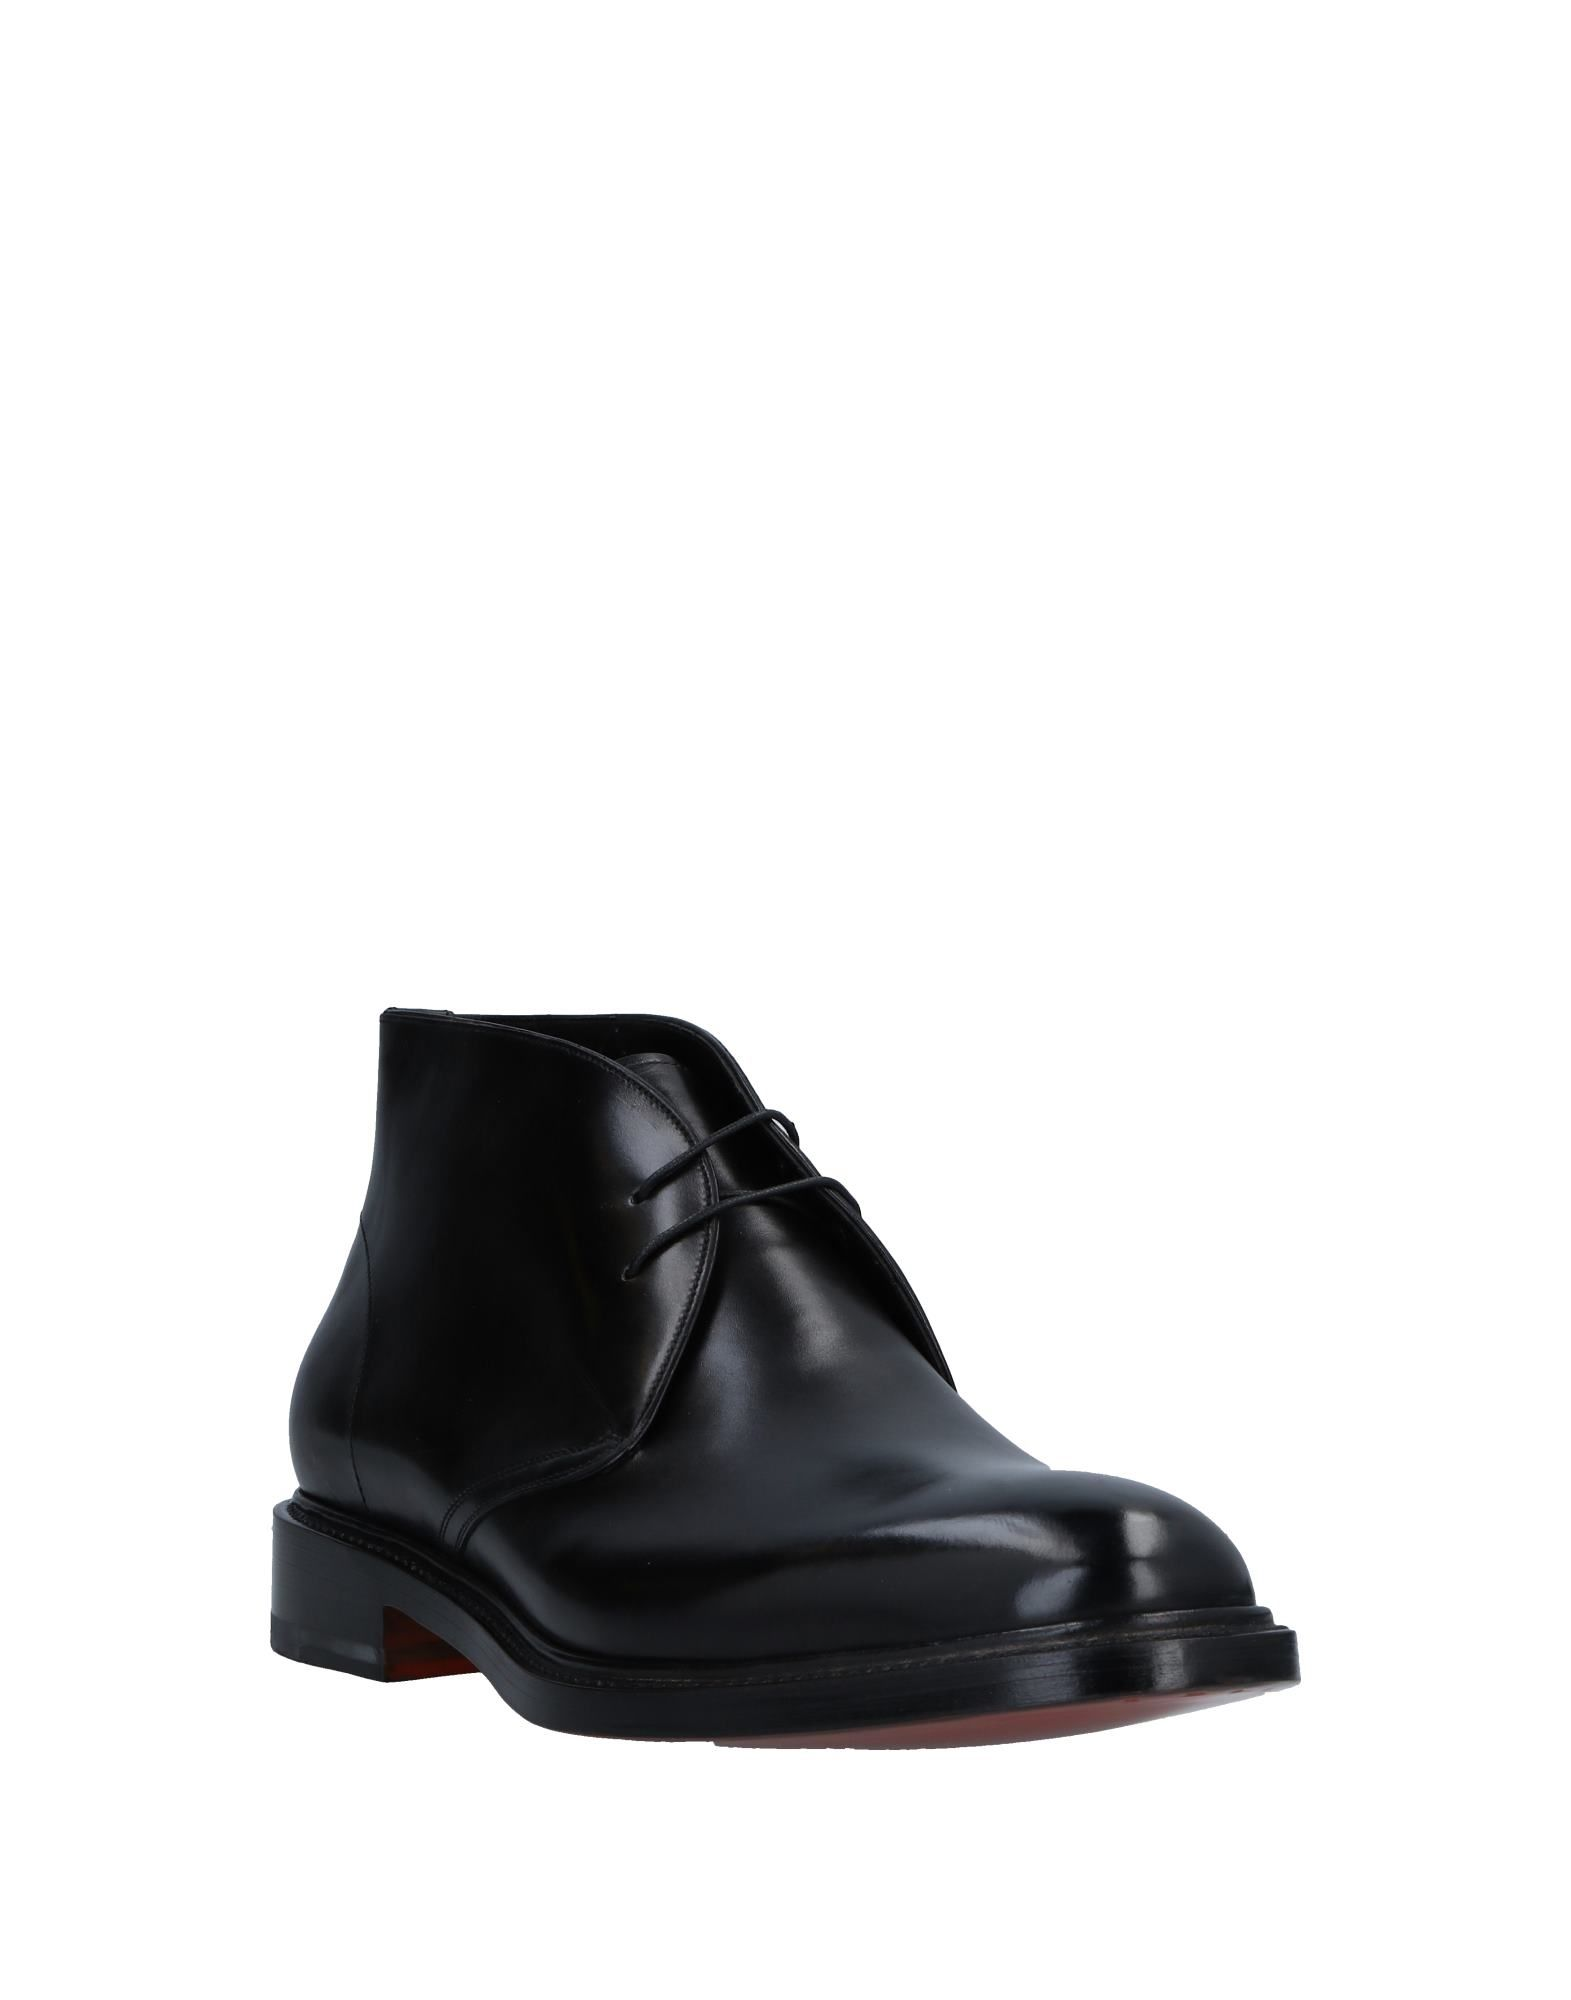 Santoni Schnürschuhe Herren  Schuhe 11534195TT Gute Qualität beliebte Schuhe  cc032c